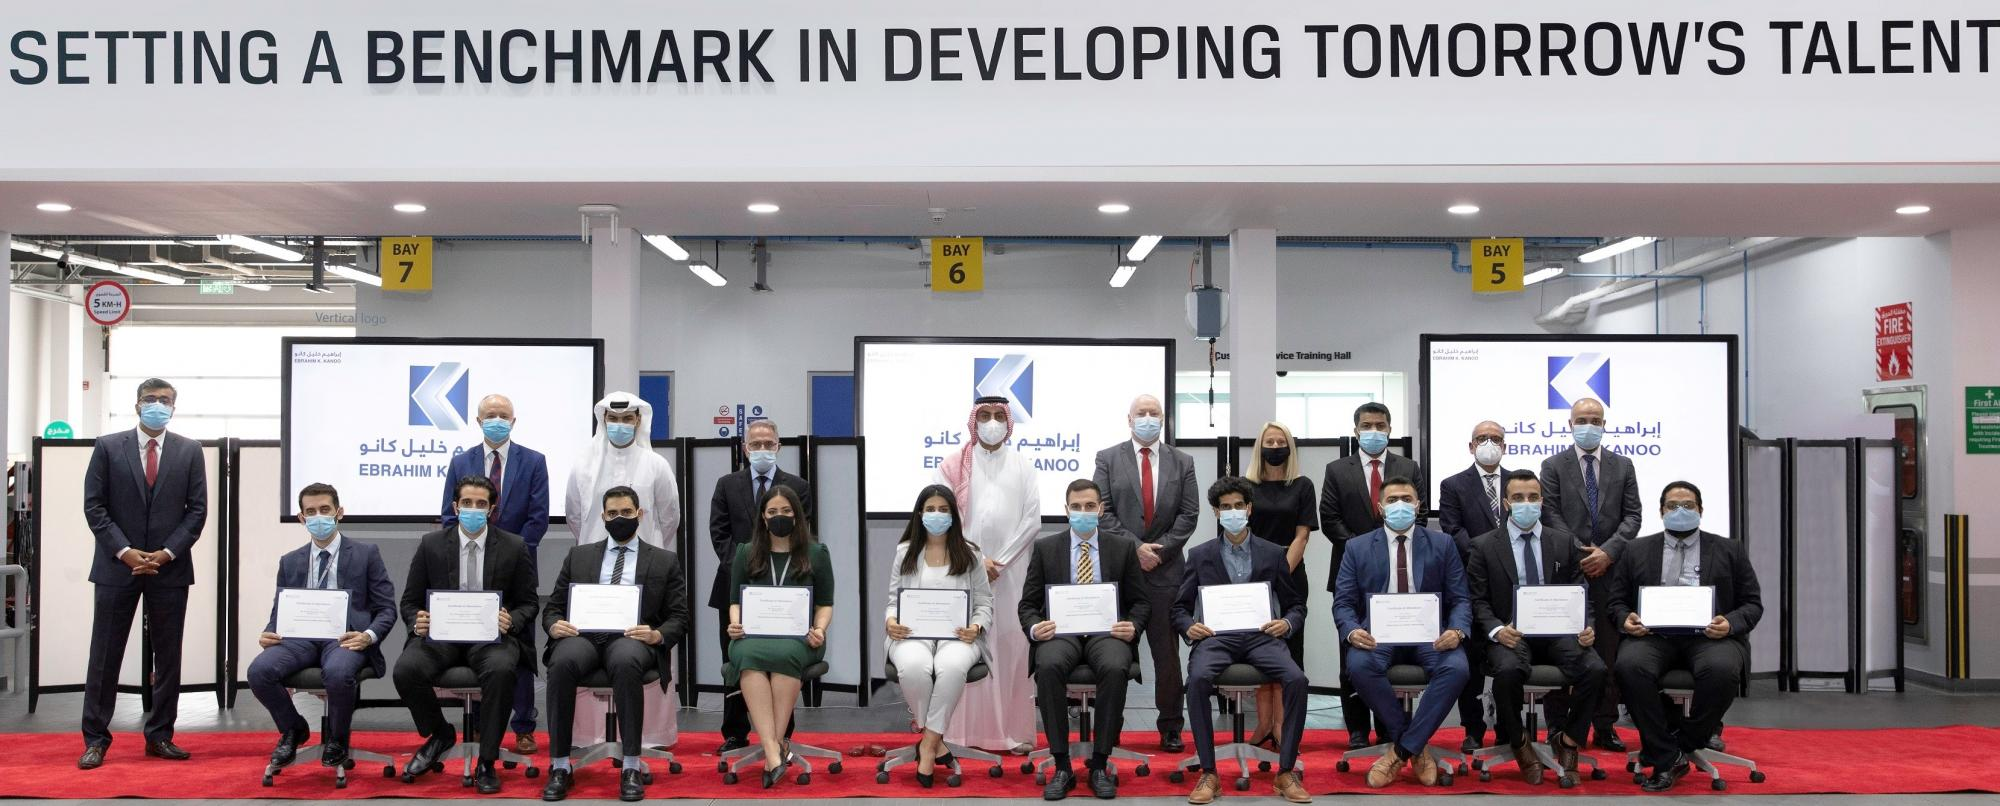 Ebrahim K. Kanoo Highlights 'Tomooh' Graduates